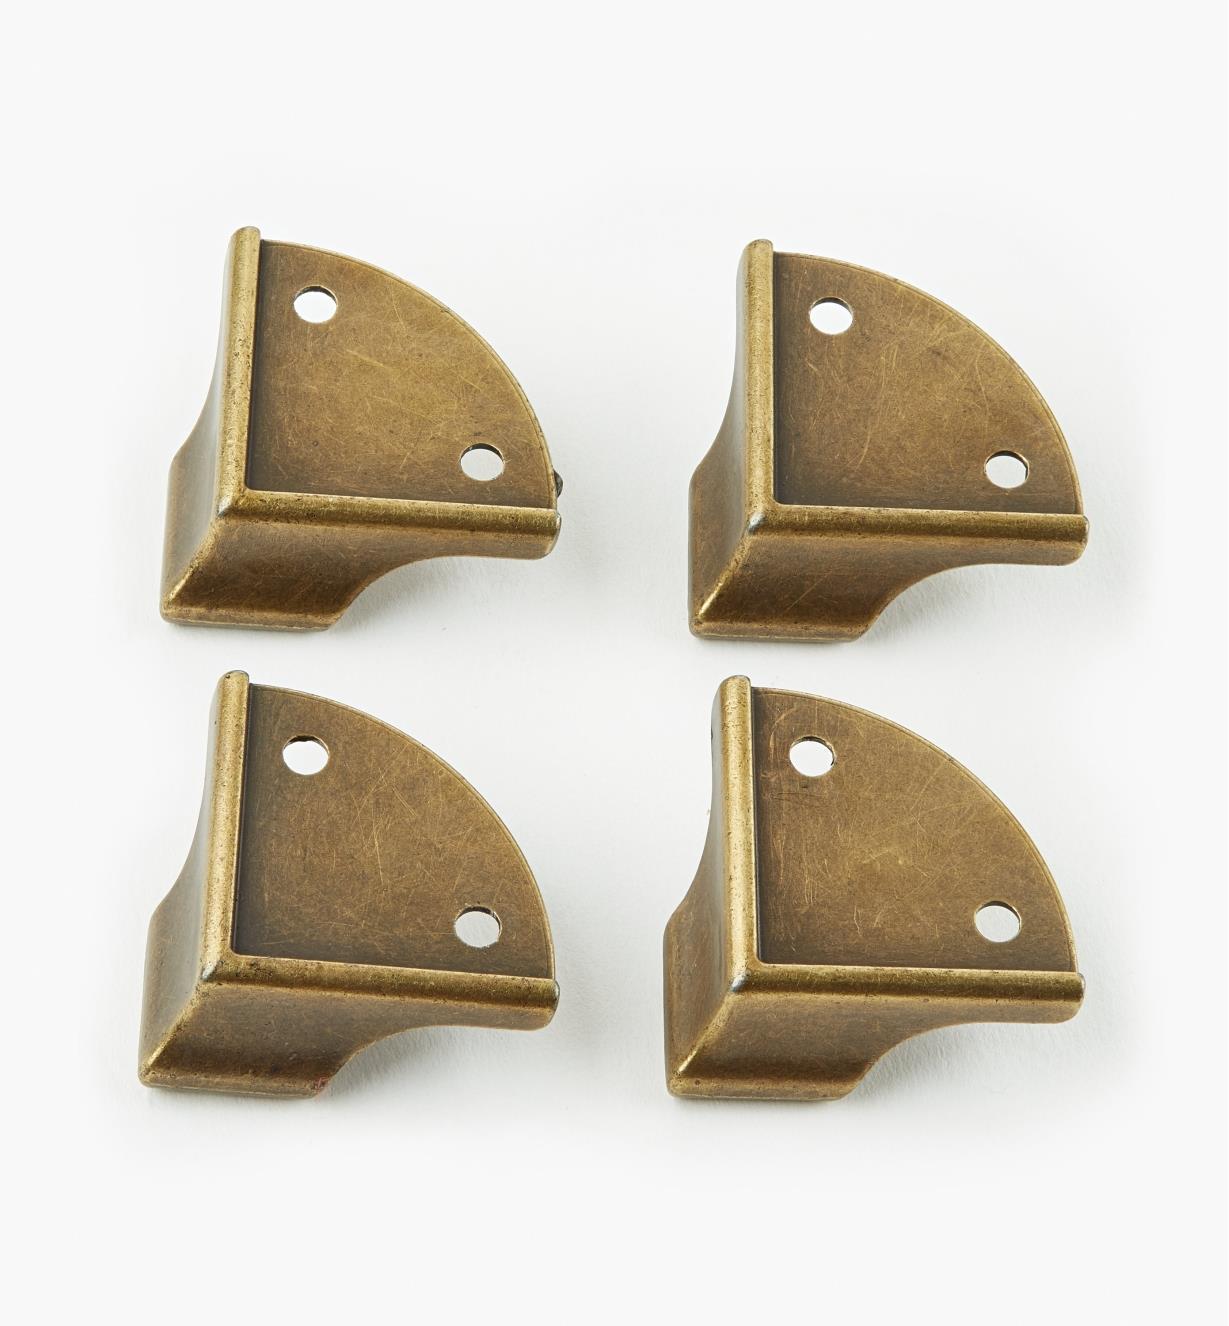 05H3152 - Pieds de coffret coulés, anglais antique, lepaquetde4